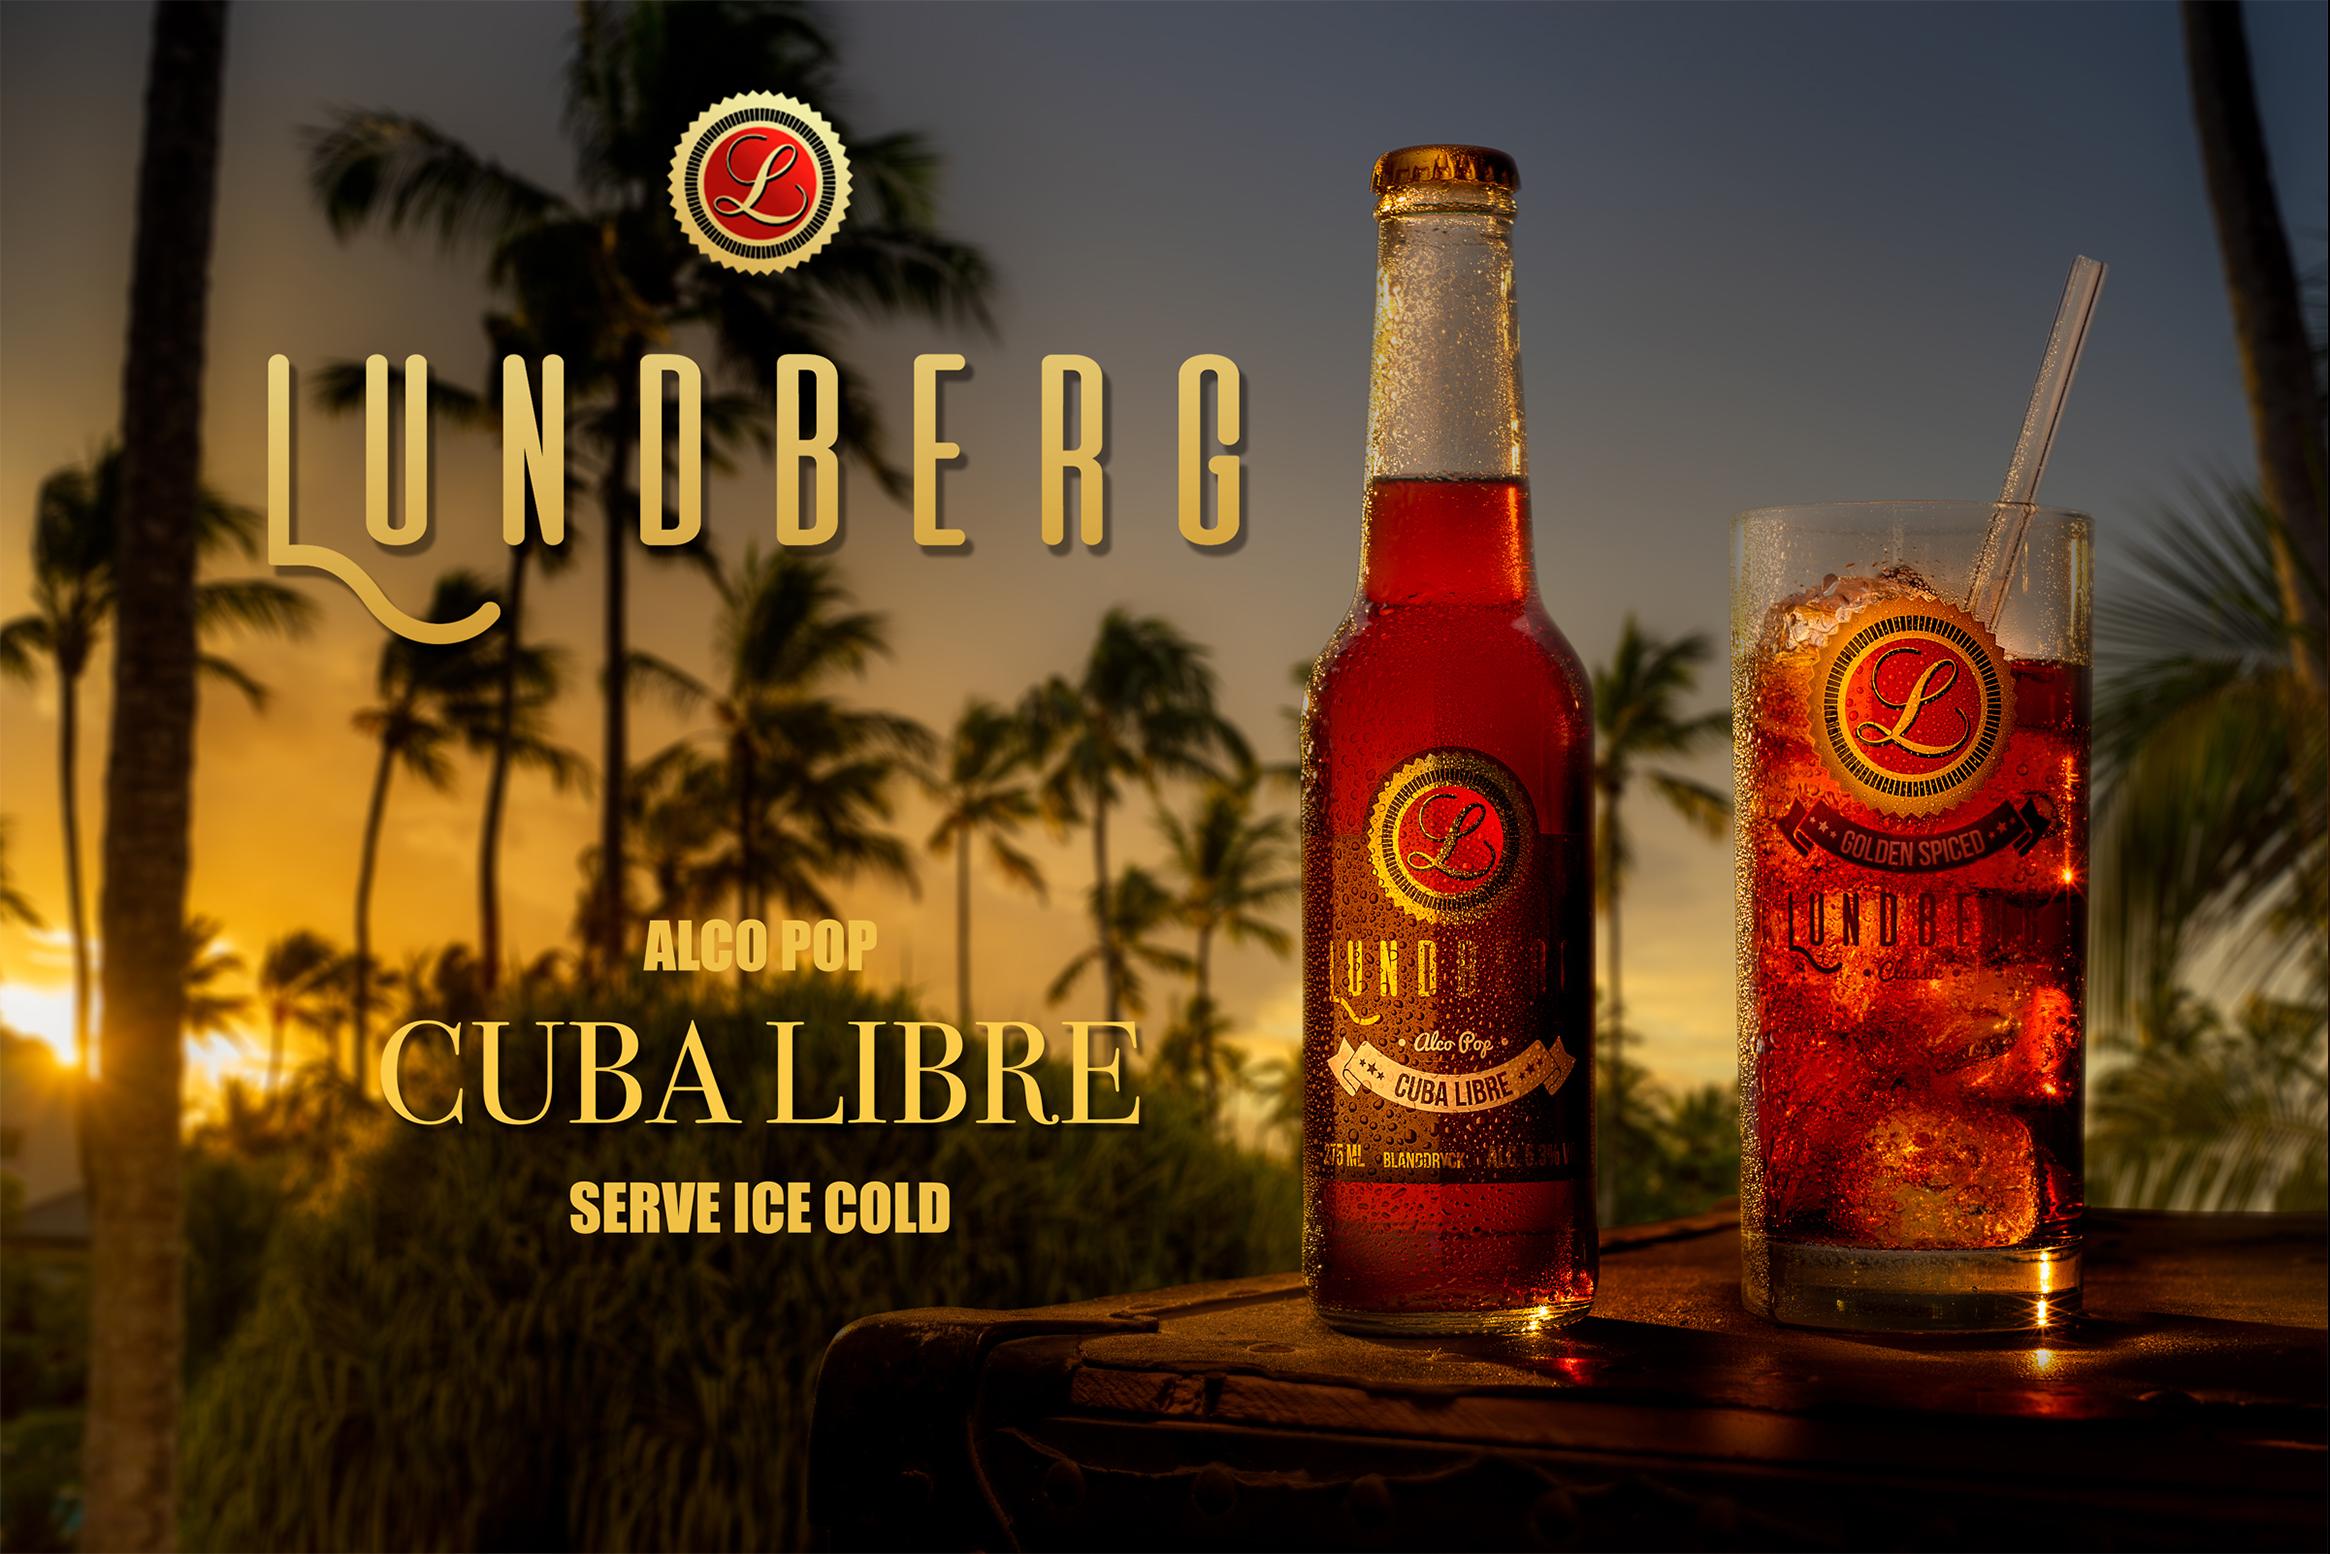 Lundberg Alco Pop: Cuba libre